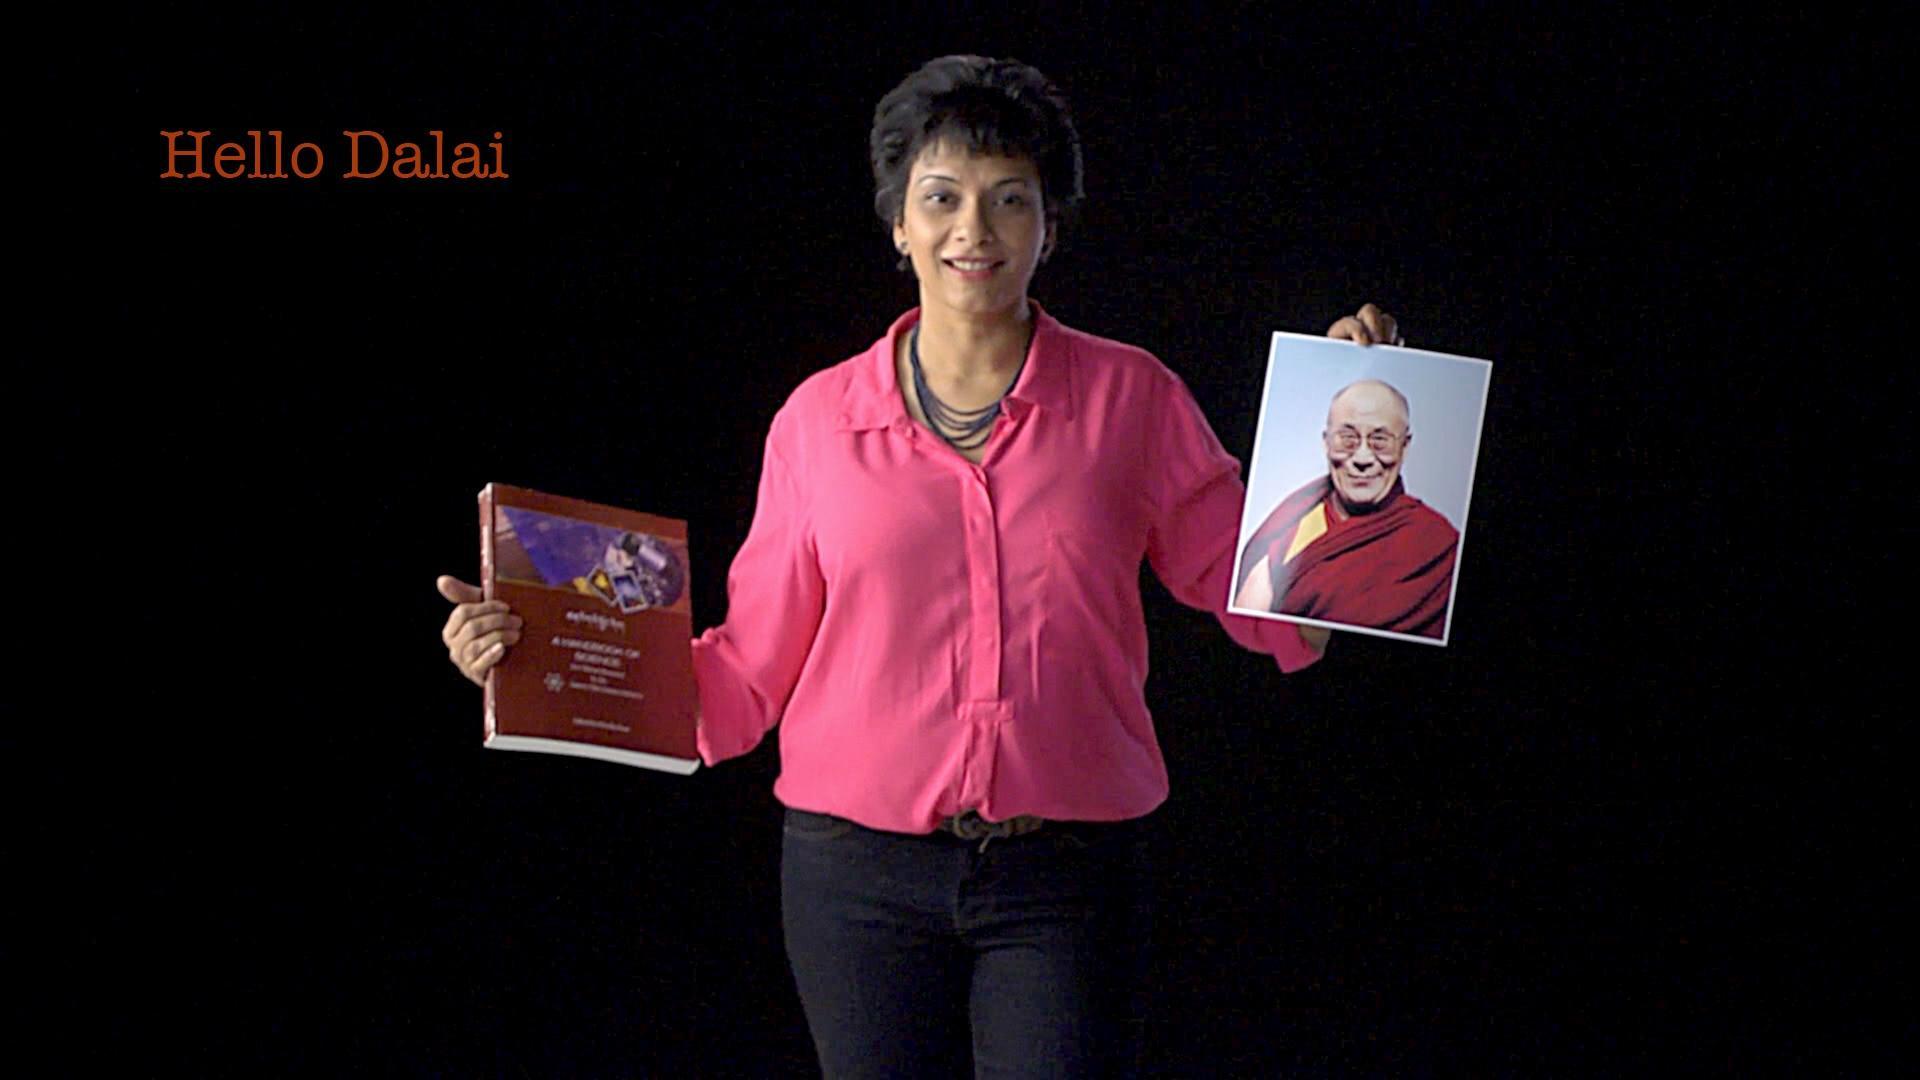 Preetha Ram: Hello Dalai image